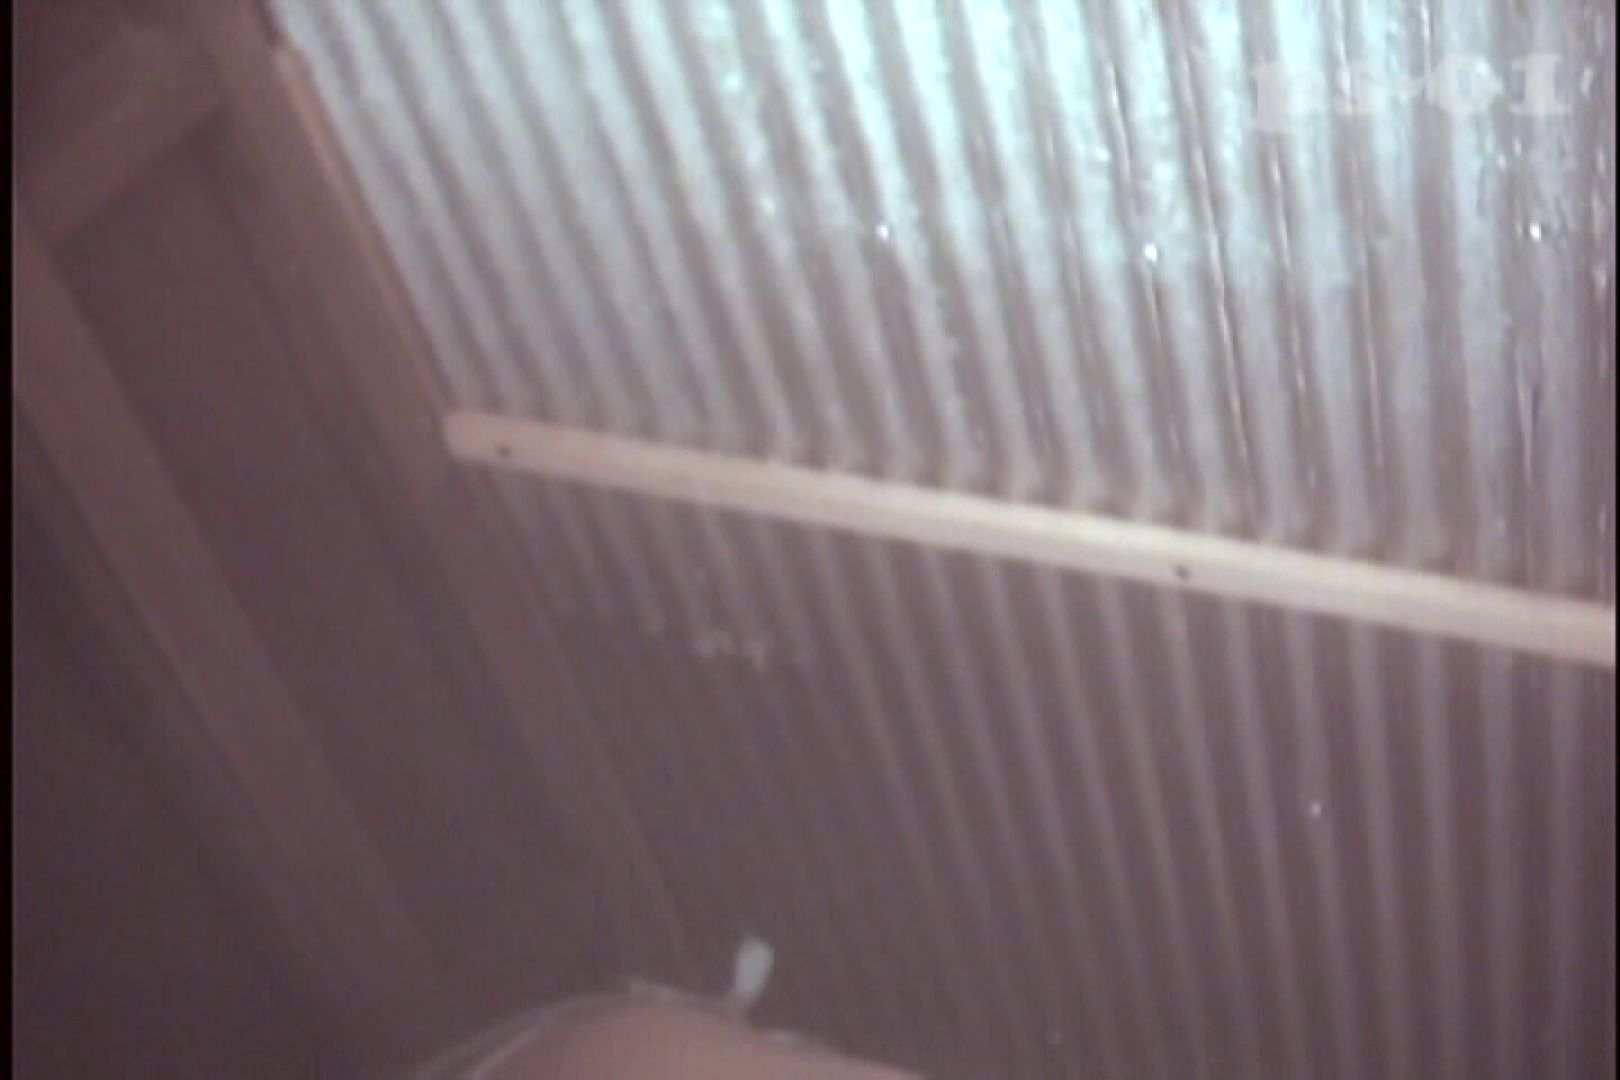 File.03 ぱっと見若いけど、お腹のたるみが出産経験を物語る。 盗撮エロすぎ | シャワー中  88連発 9